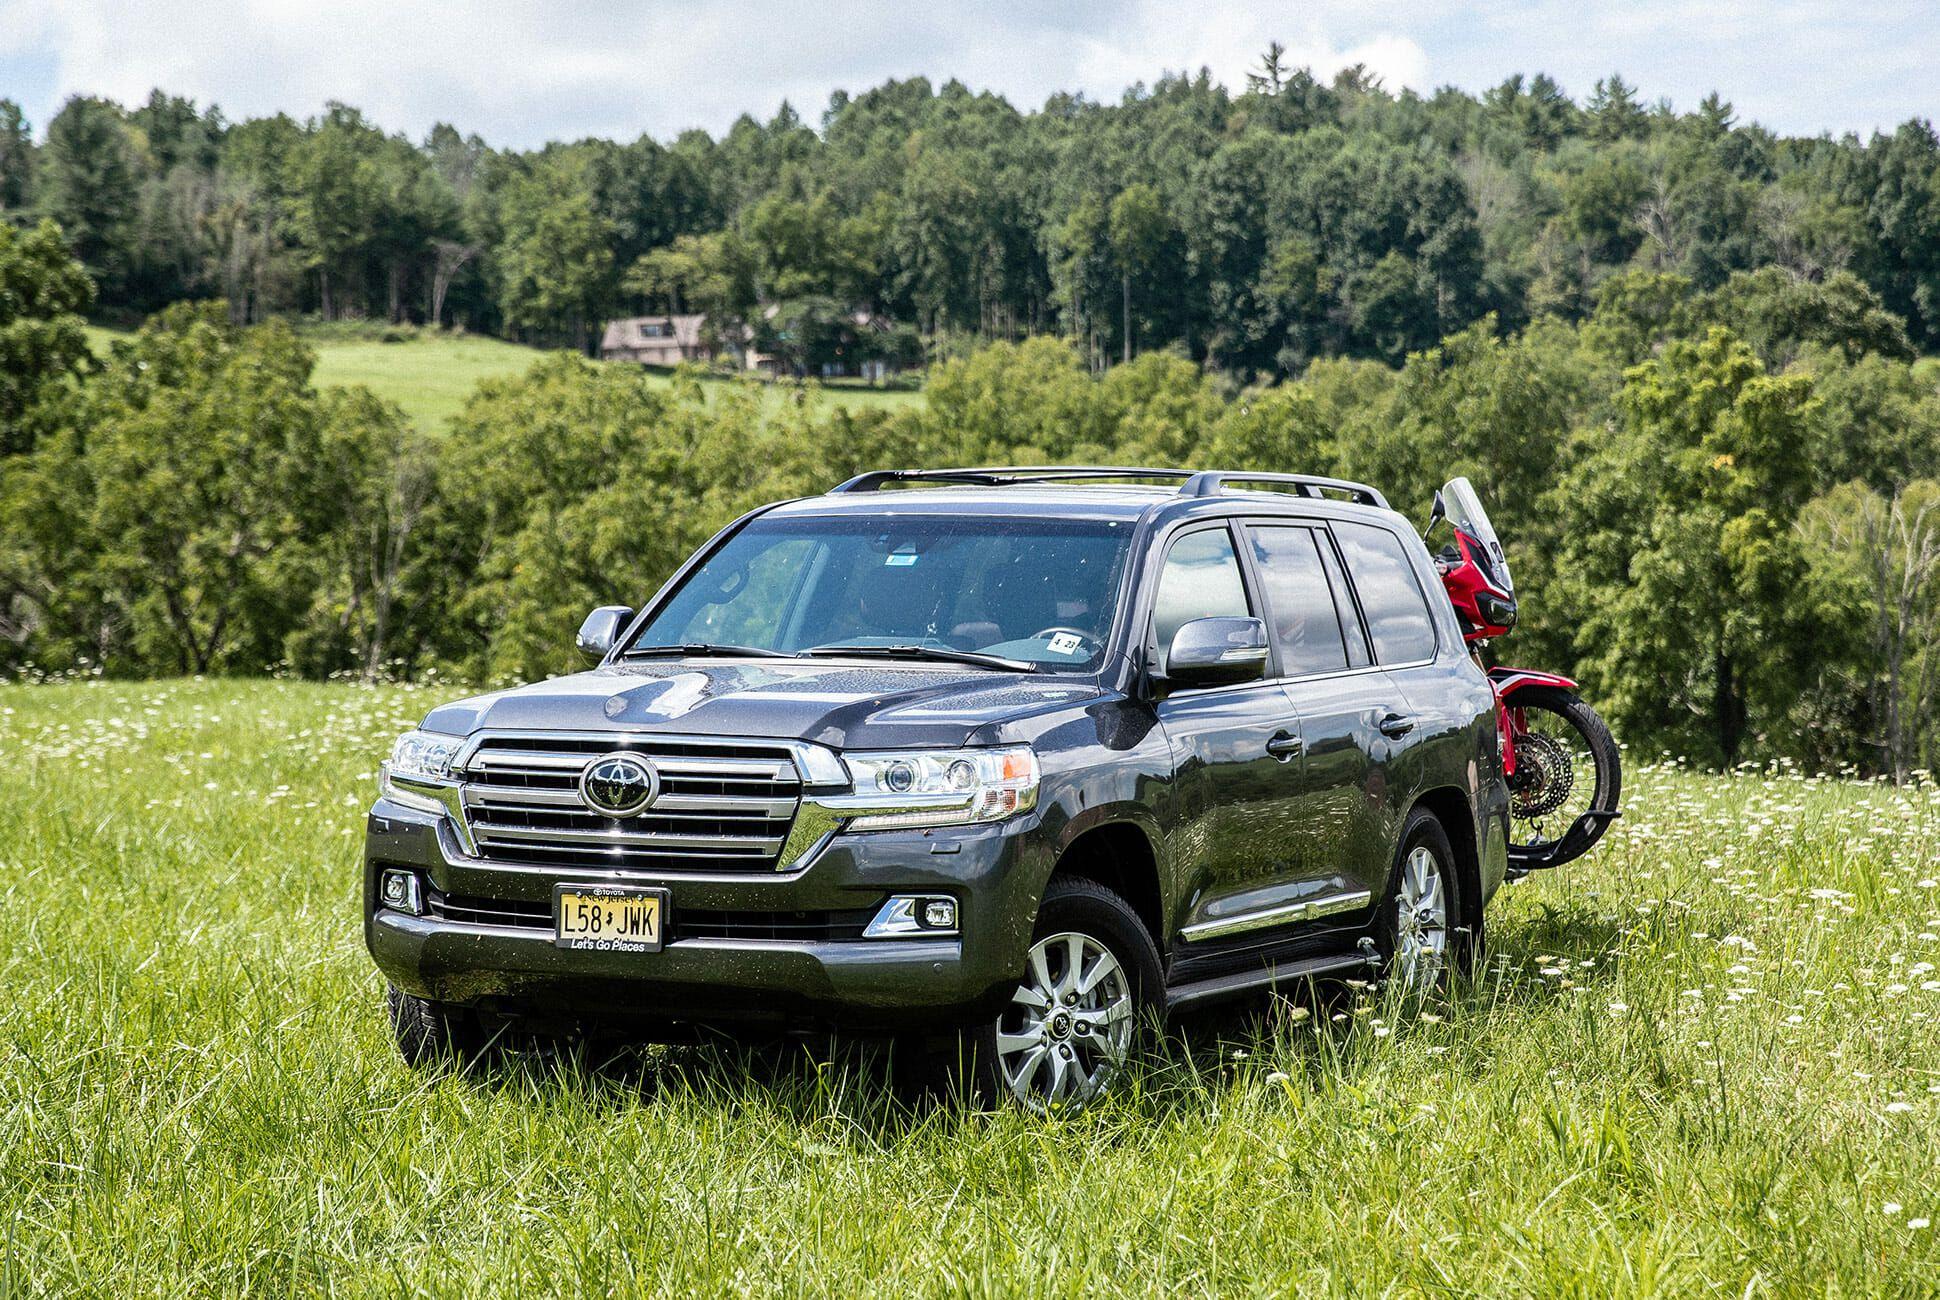 Toyota-Land-Cruiser-Op-Ed-gear-patrol-slide-1